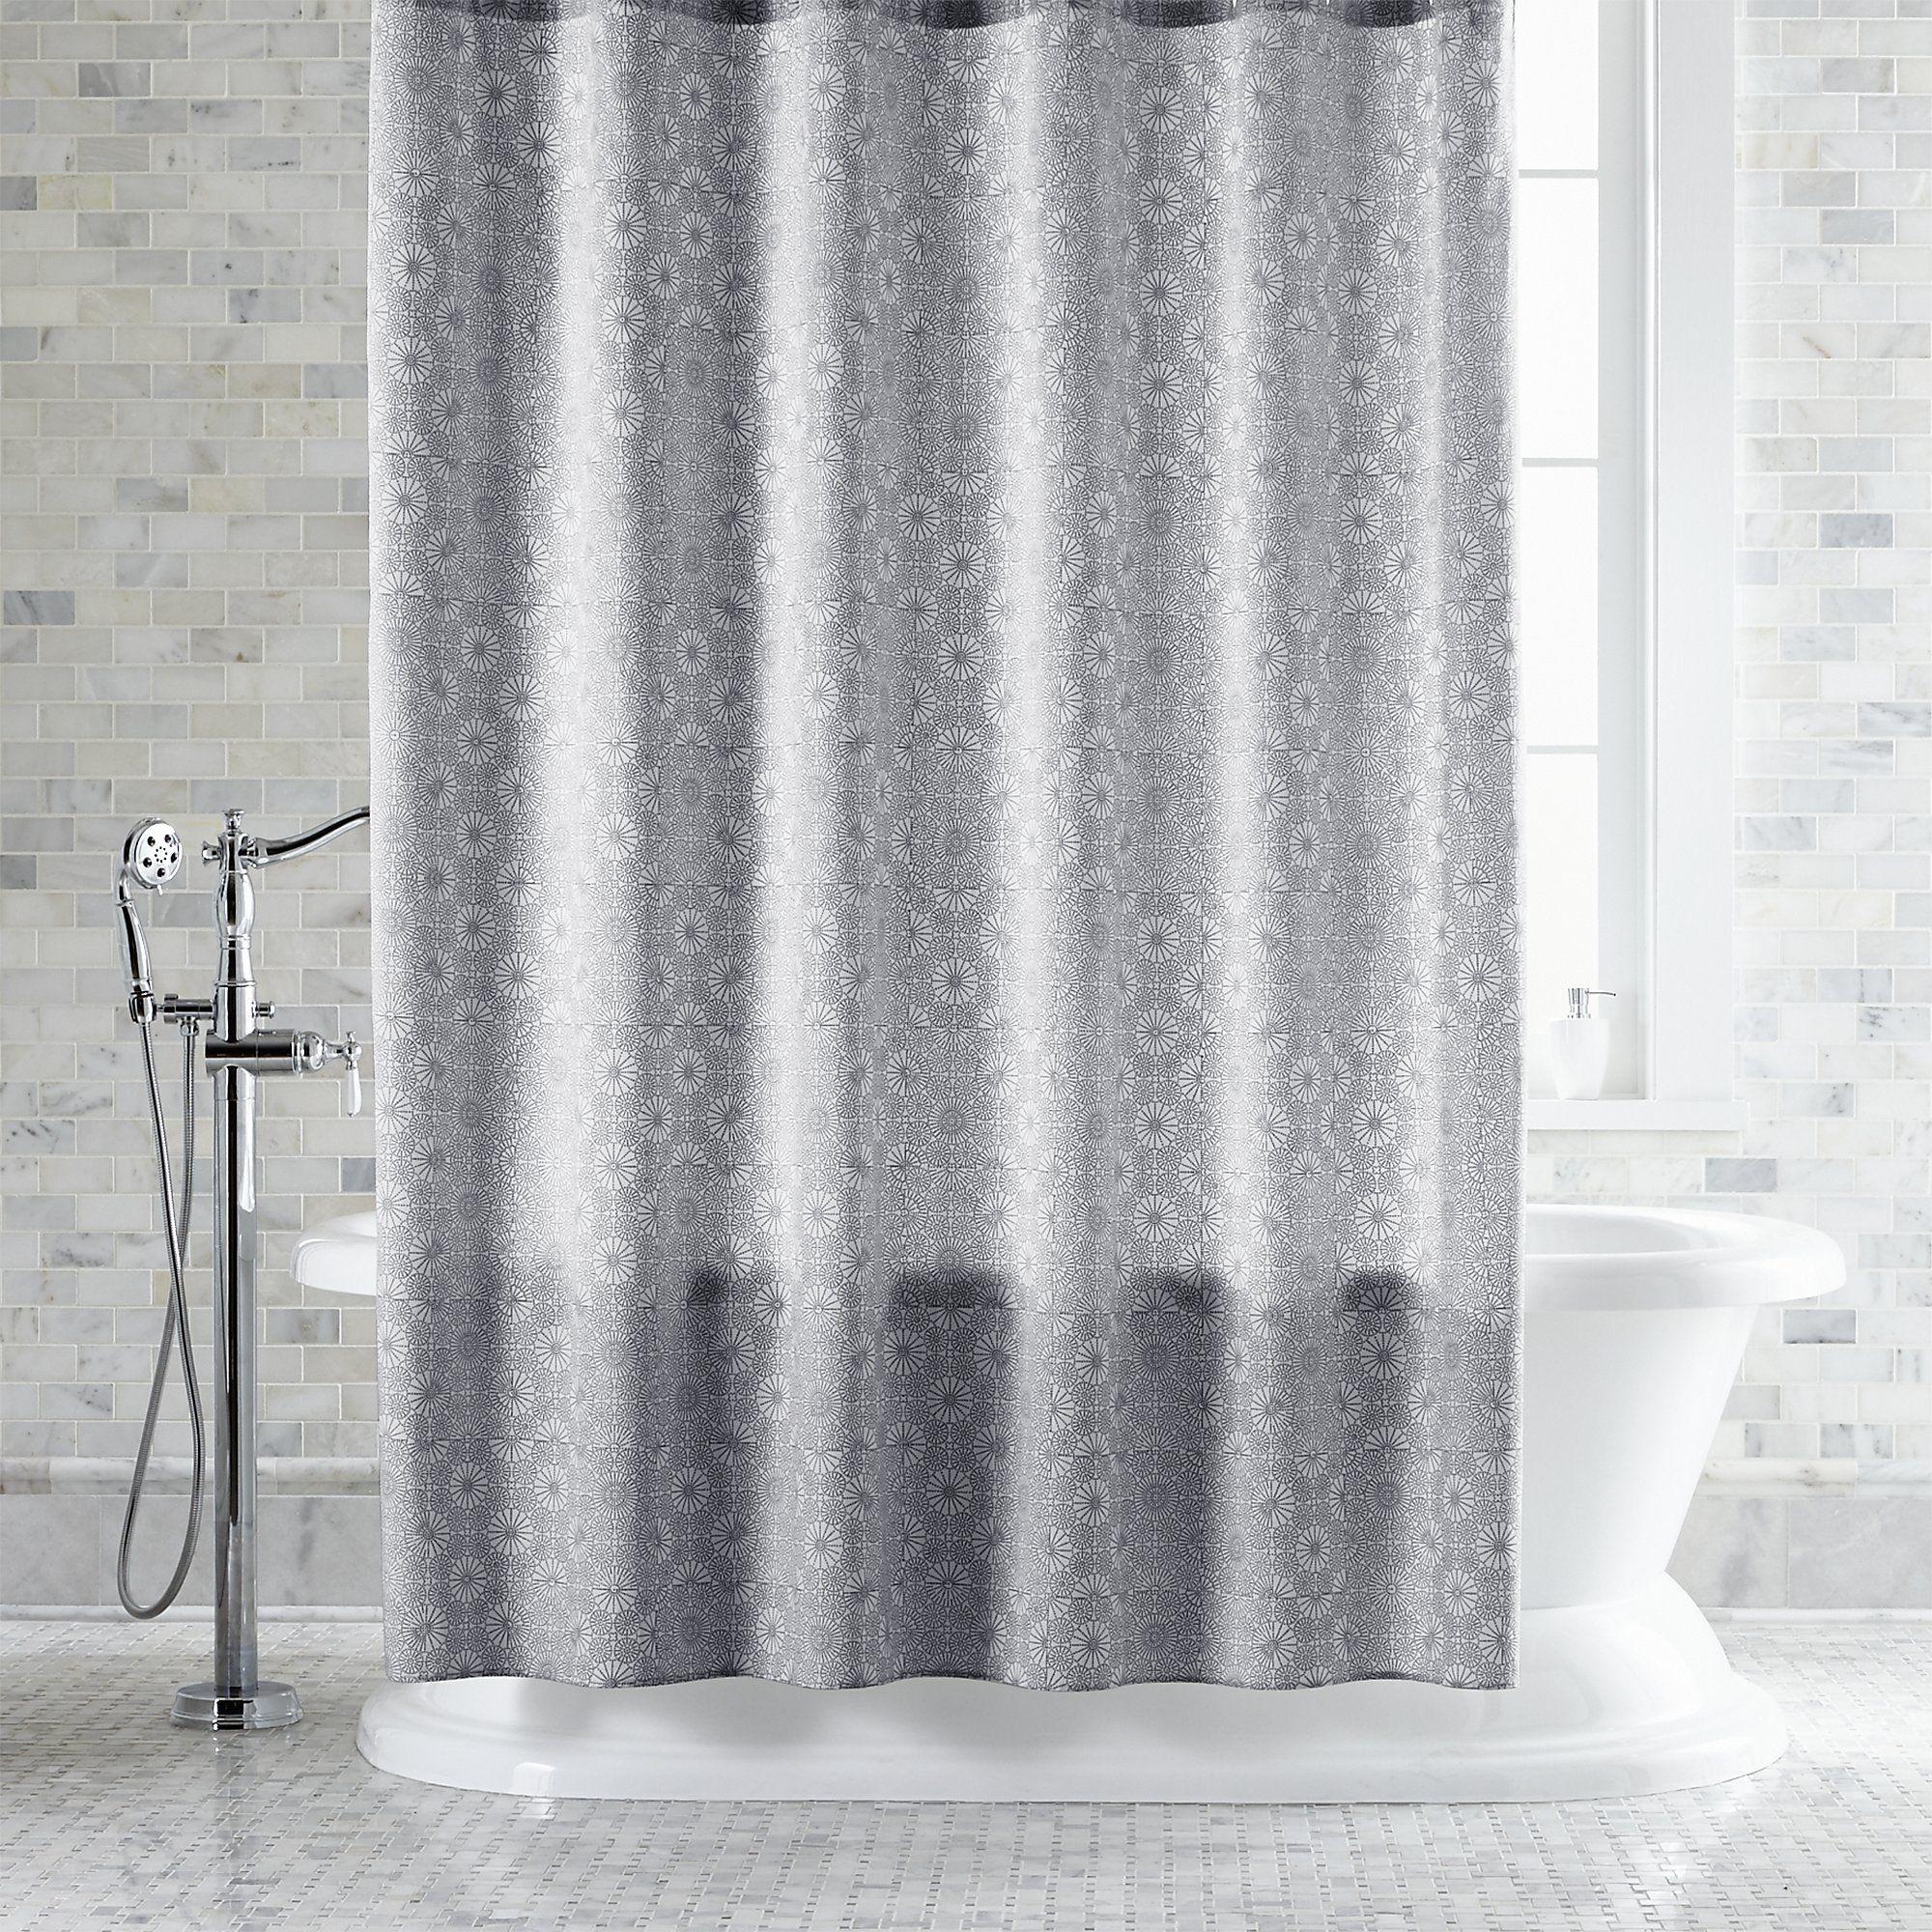 Marimekko Kioto Light Grey Shower Curtain Gray Shower Curtains Blue Shower Curtains Shower Curtain